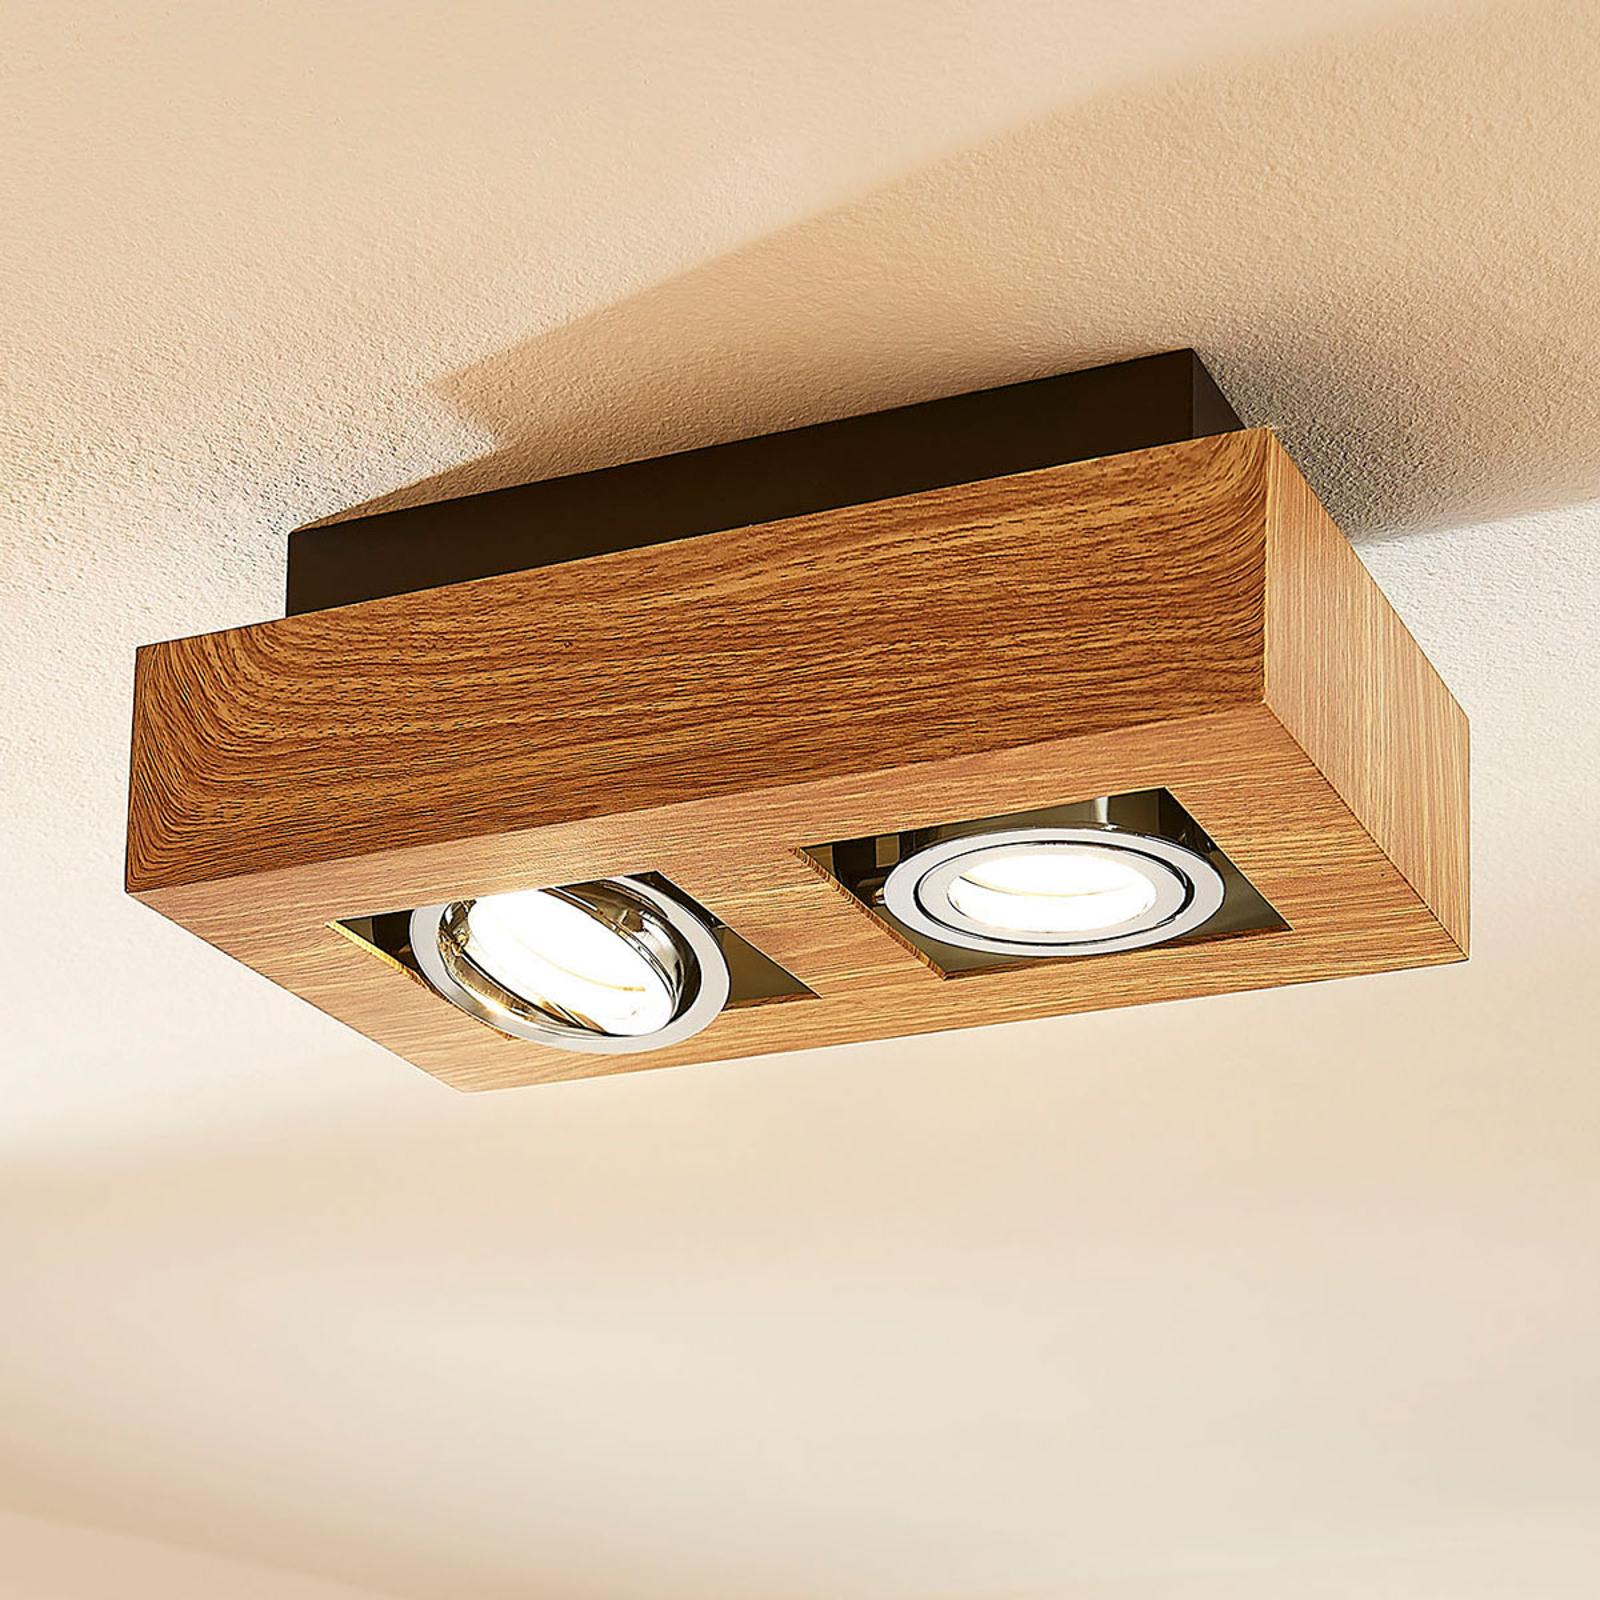 Lampa sufitowa LED Vince, 25x14cm wygląd drewna